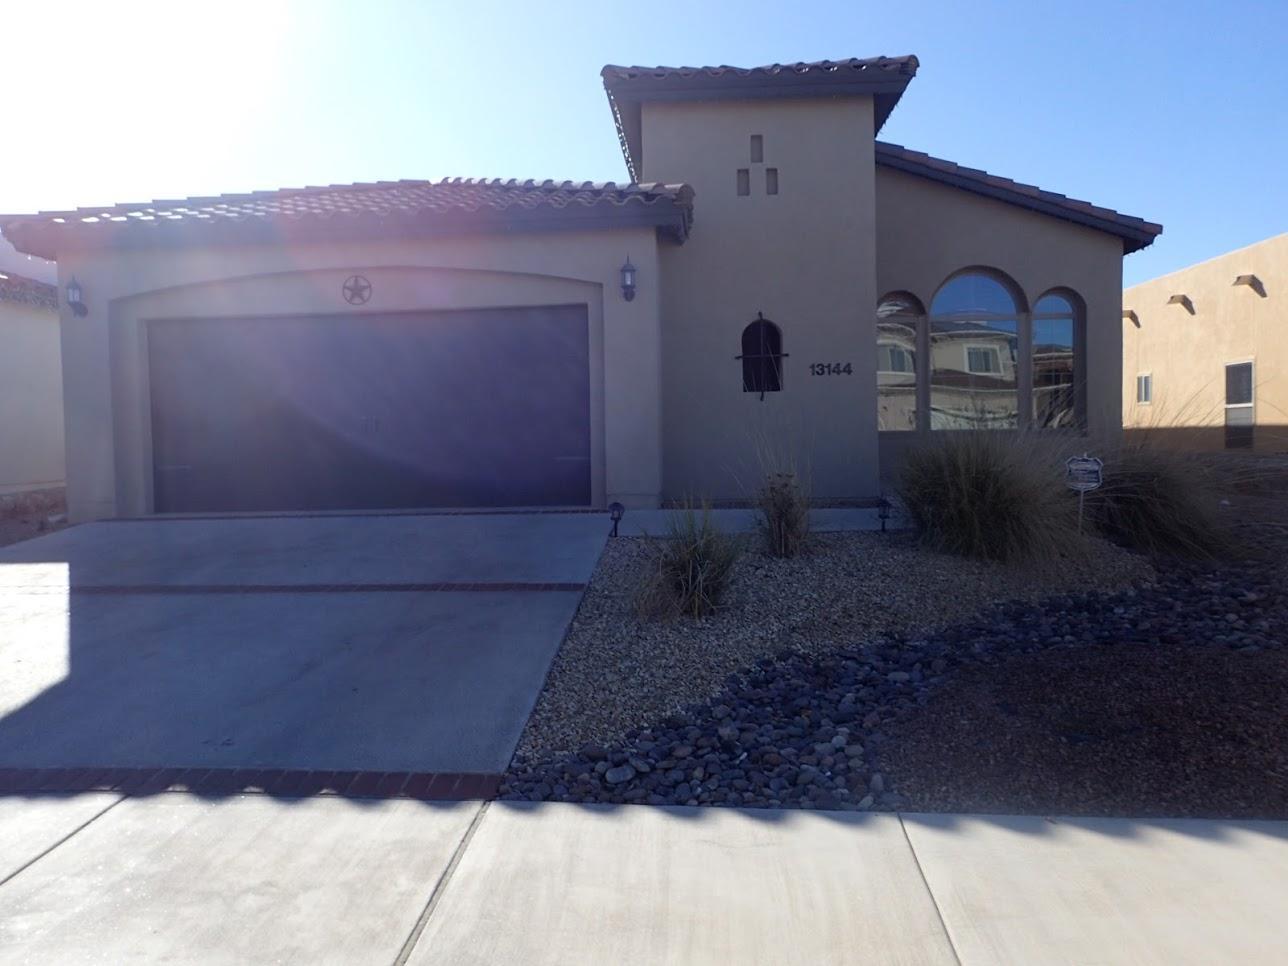 13144 MYSTIC PATH, El Paso, Texas 79938, 4 Bedrooms Bedrooms, ,2 BathroomsBathrooms,Residential Rental,For Rent,MYSTIC PATH,820676